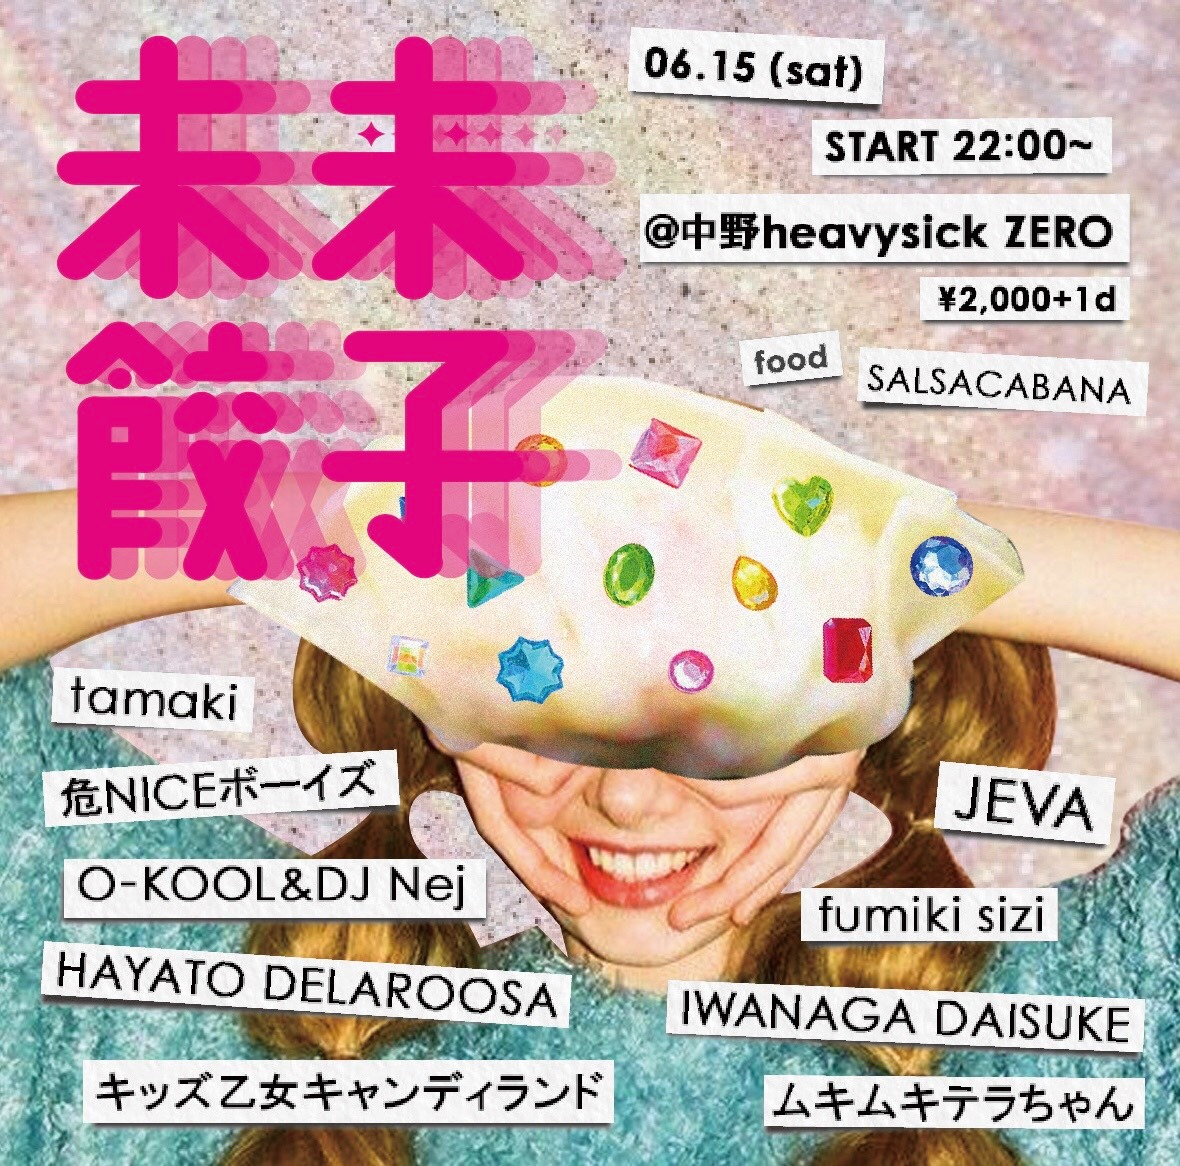 2019.06.15(sat)中野heavy sick zero 未来餃子